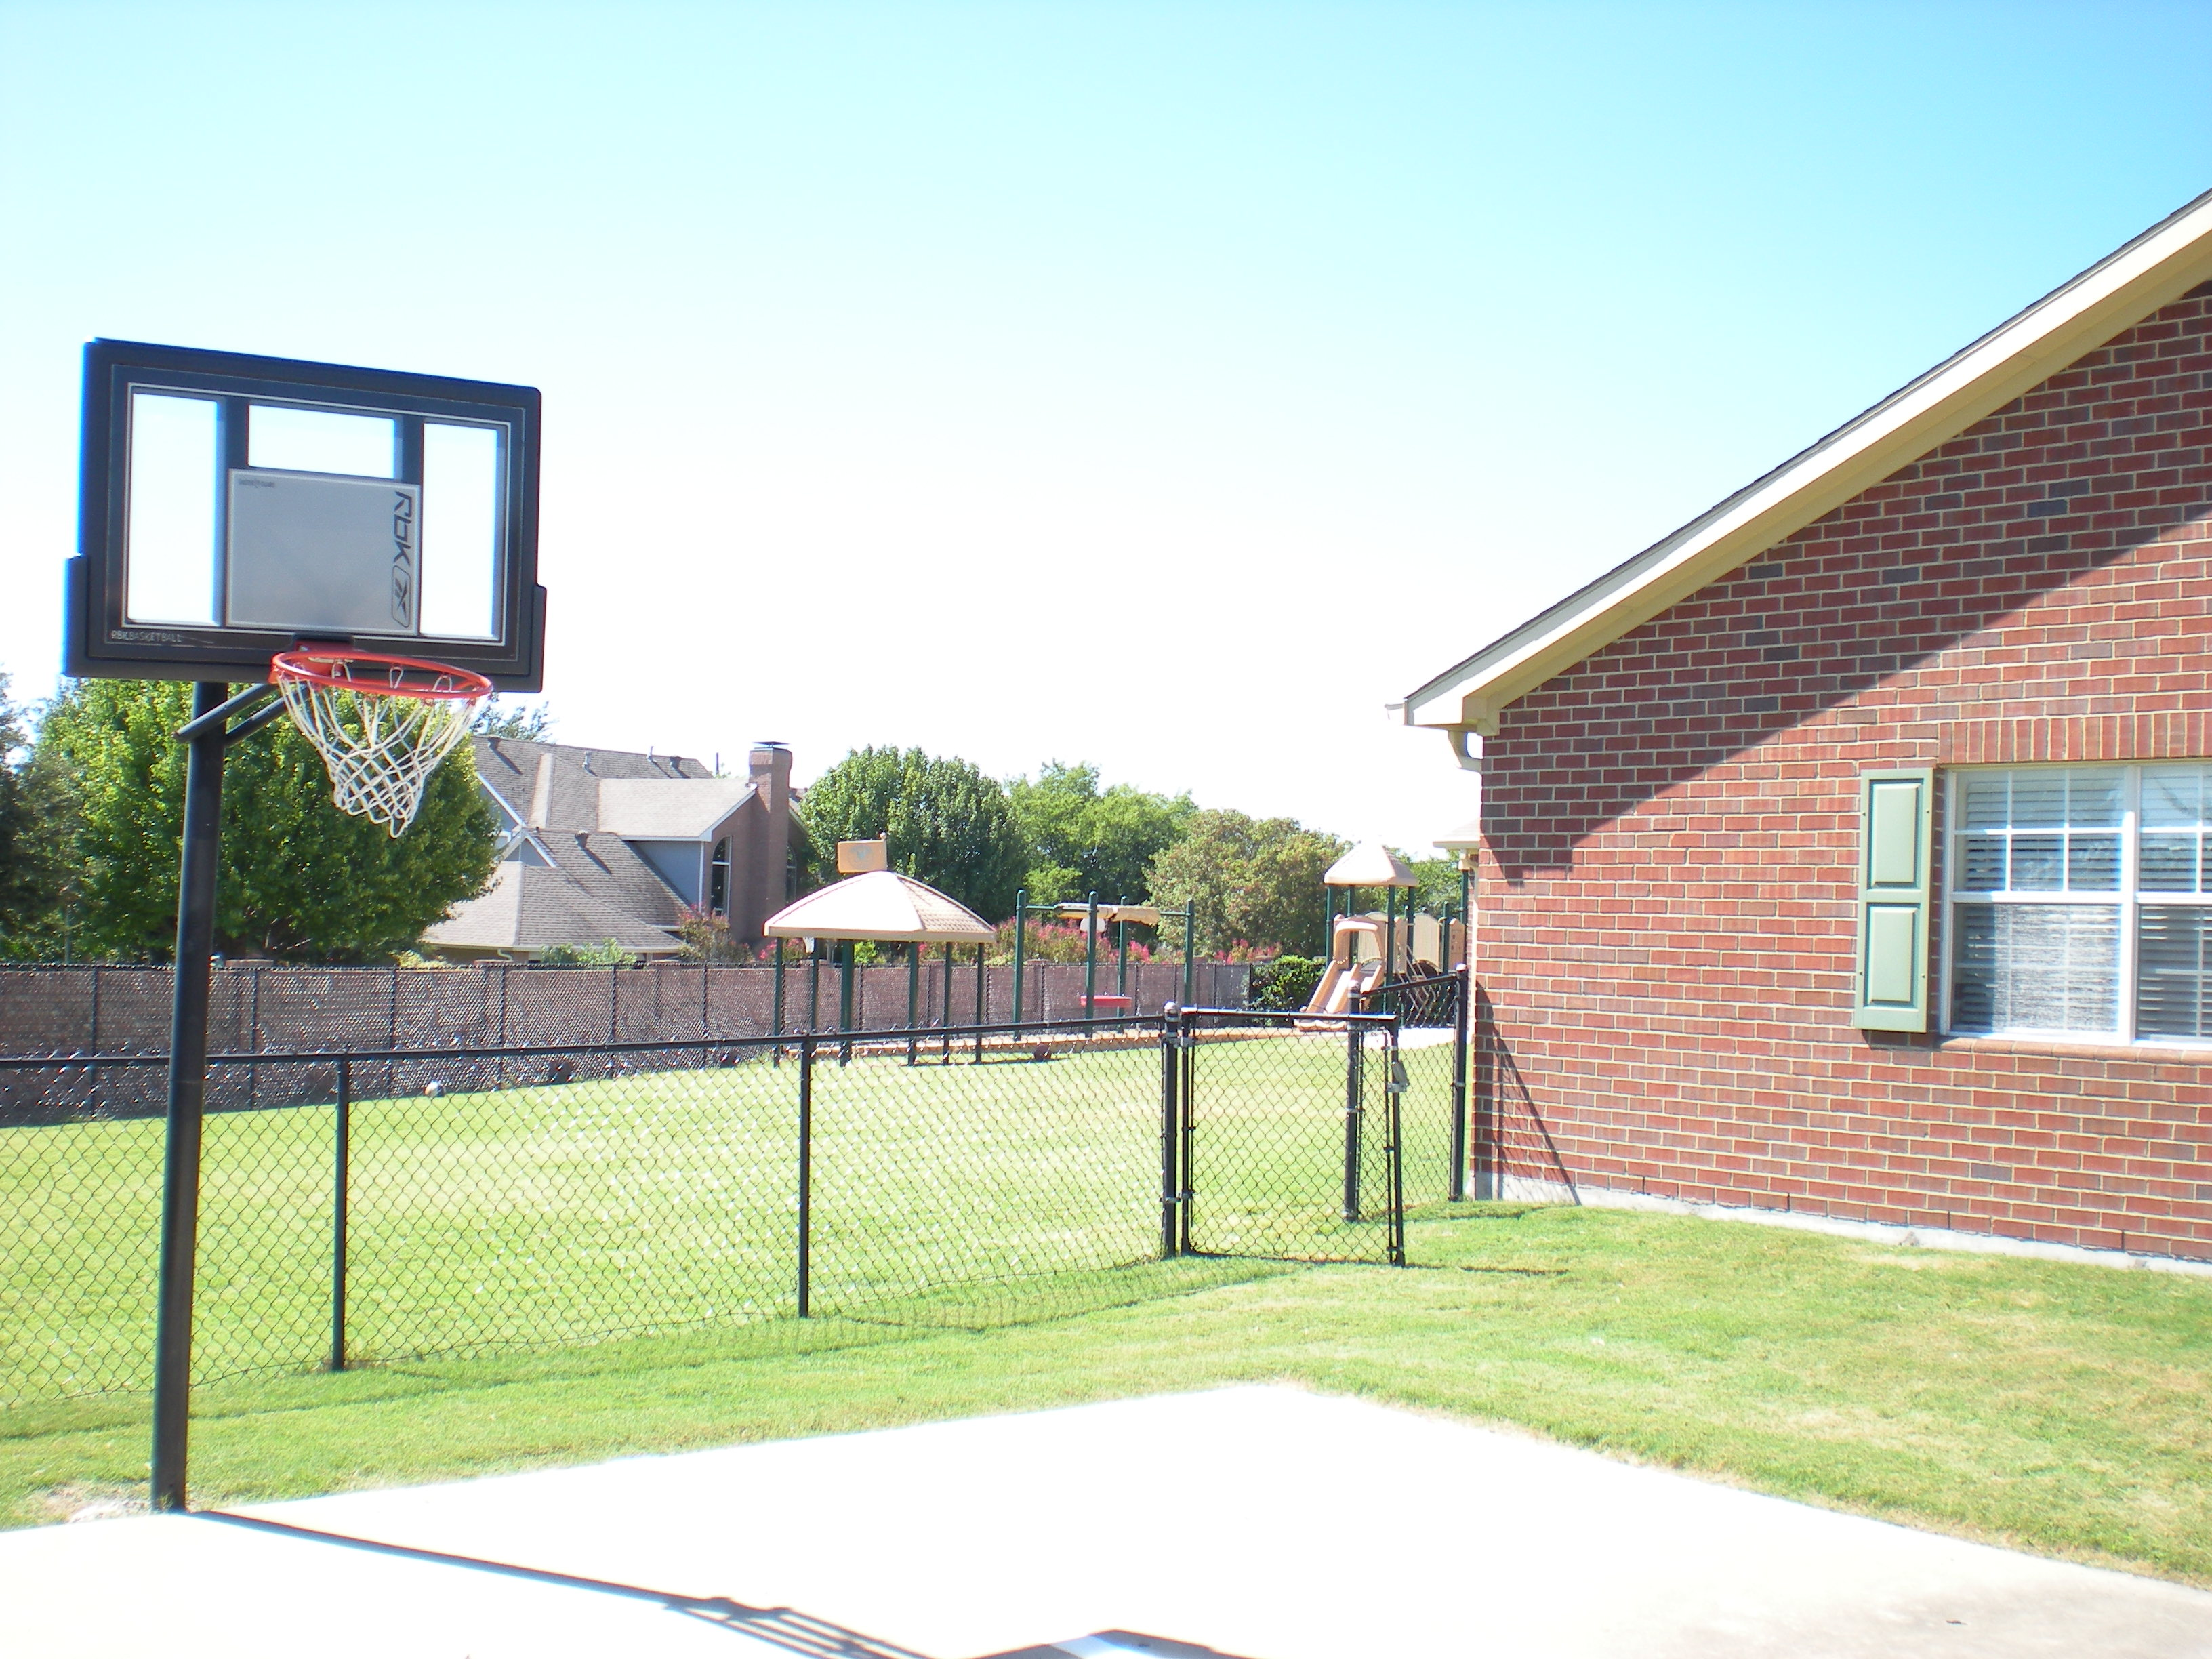 Primrose School of Rockwall image 5